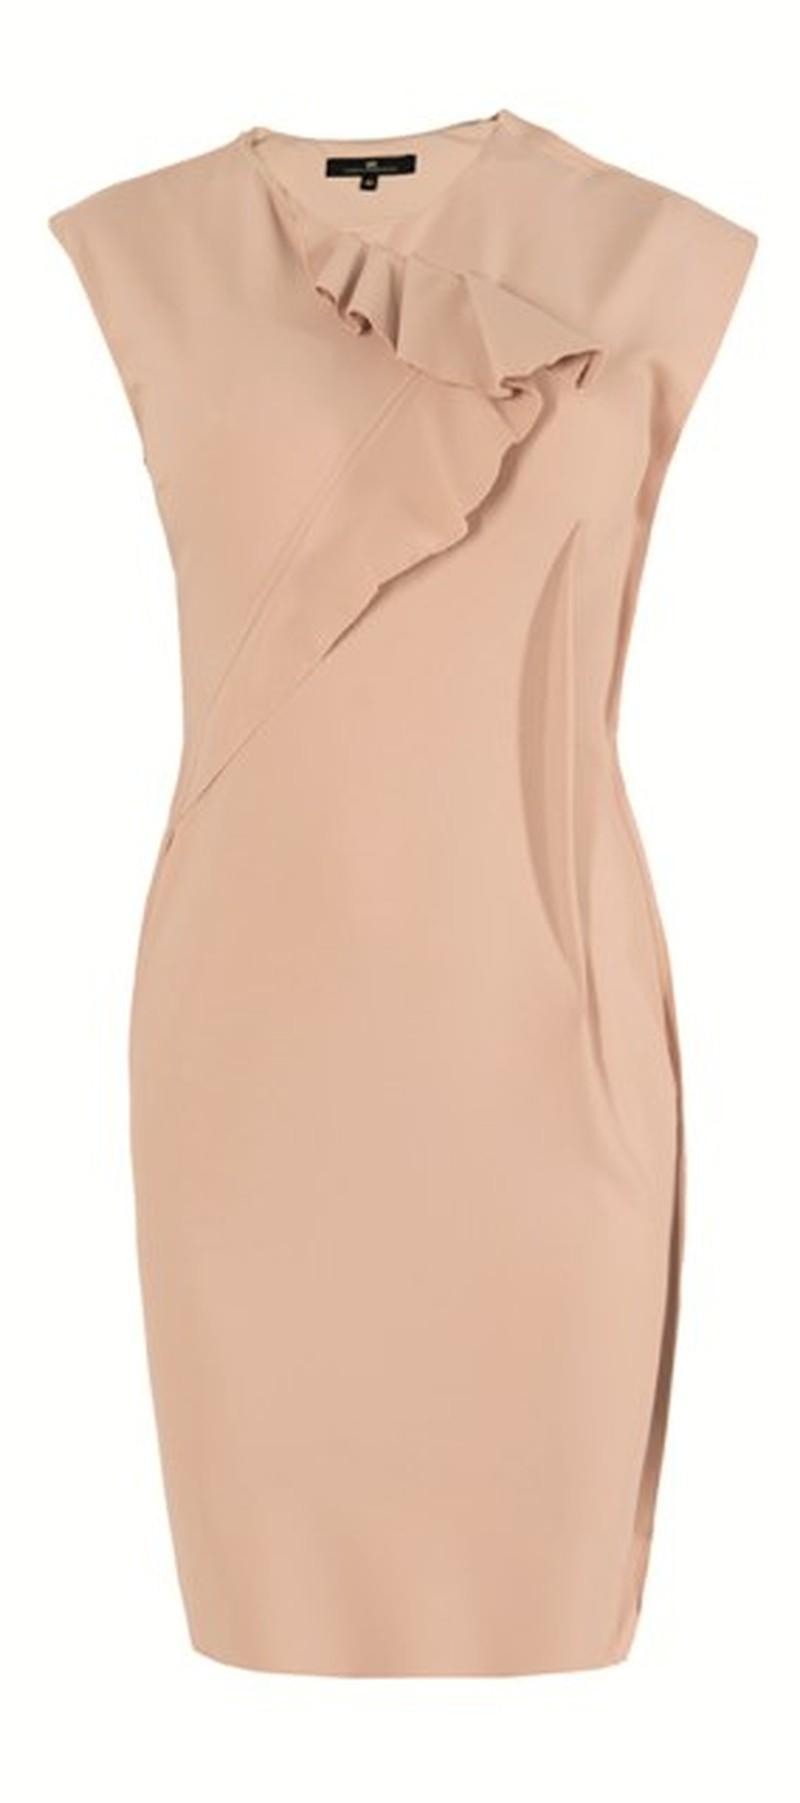 ecru sukienka Elisabetta Franchi Celyn b - wiosna/lato 2011